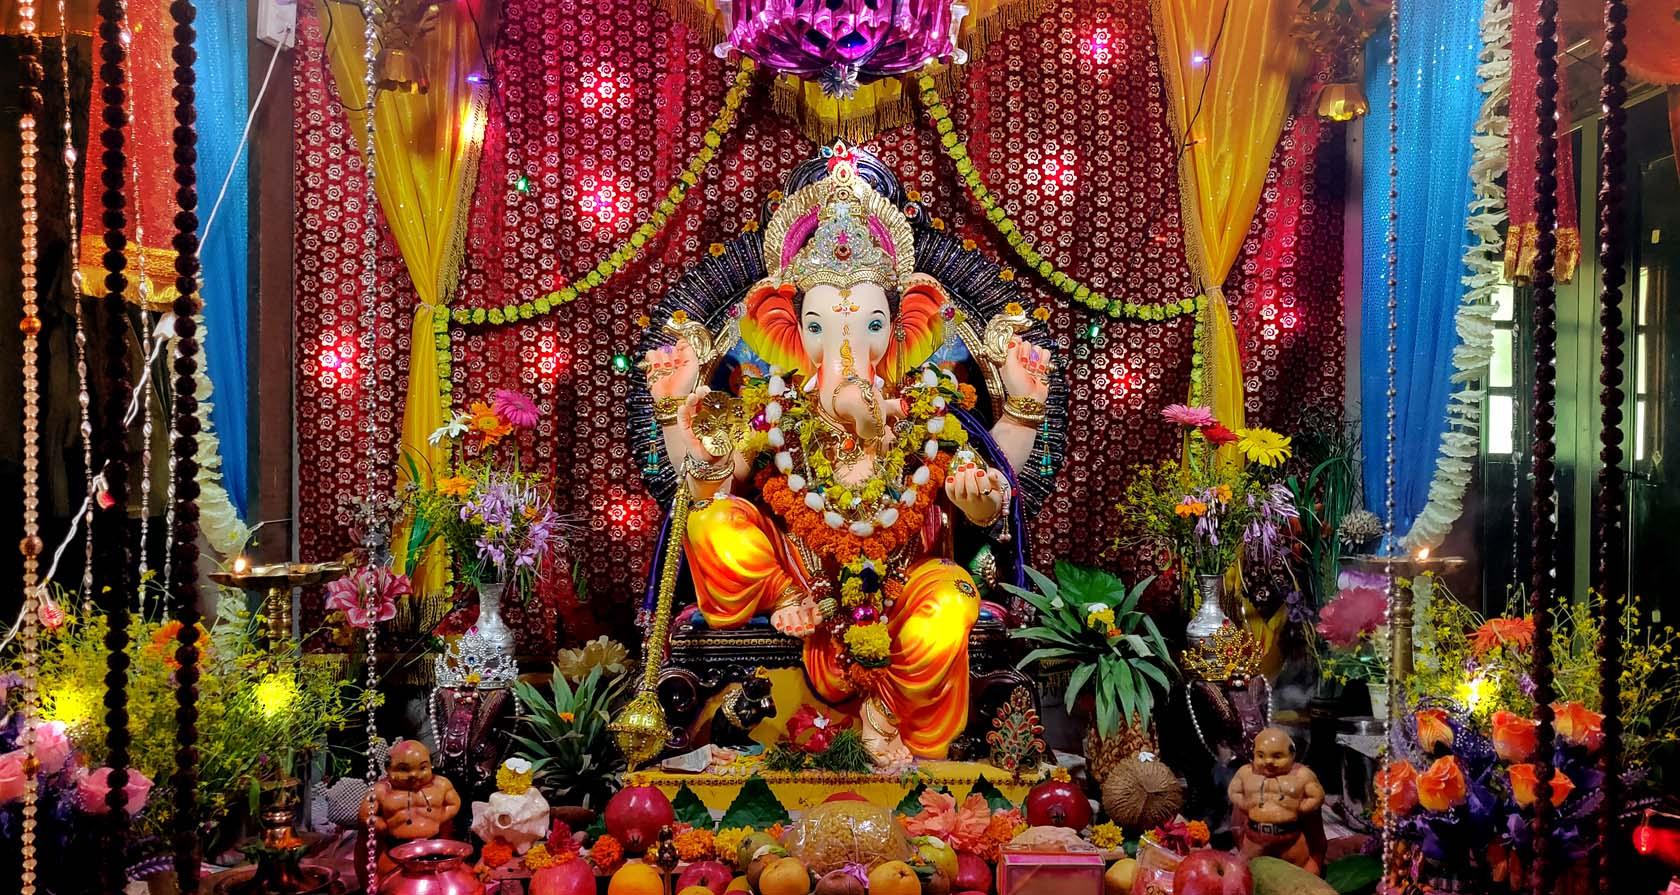 Lord Ganesha Festival Decoration Ideas on Ganesh Chaturthi